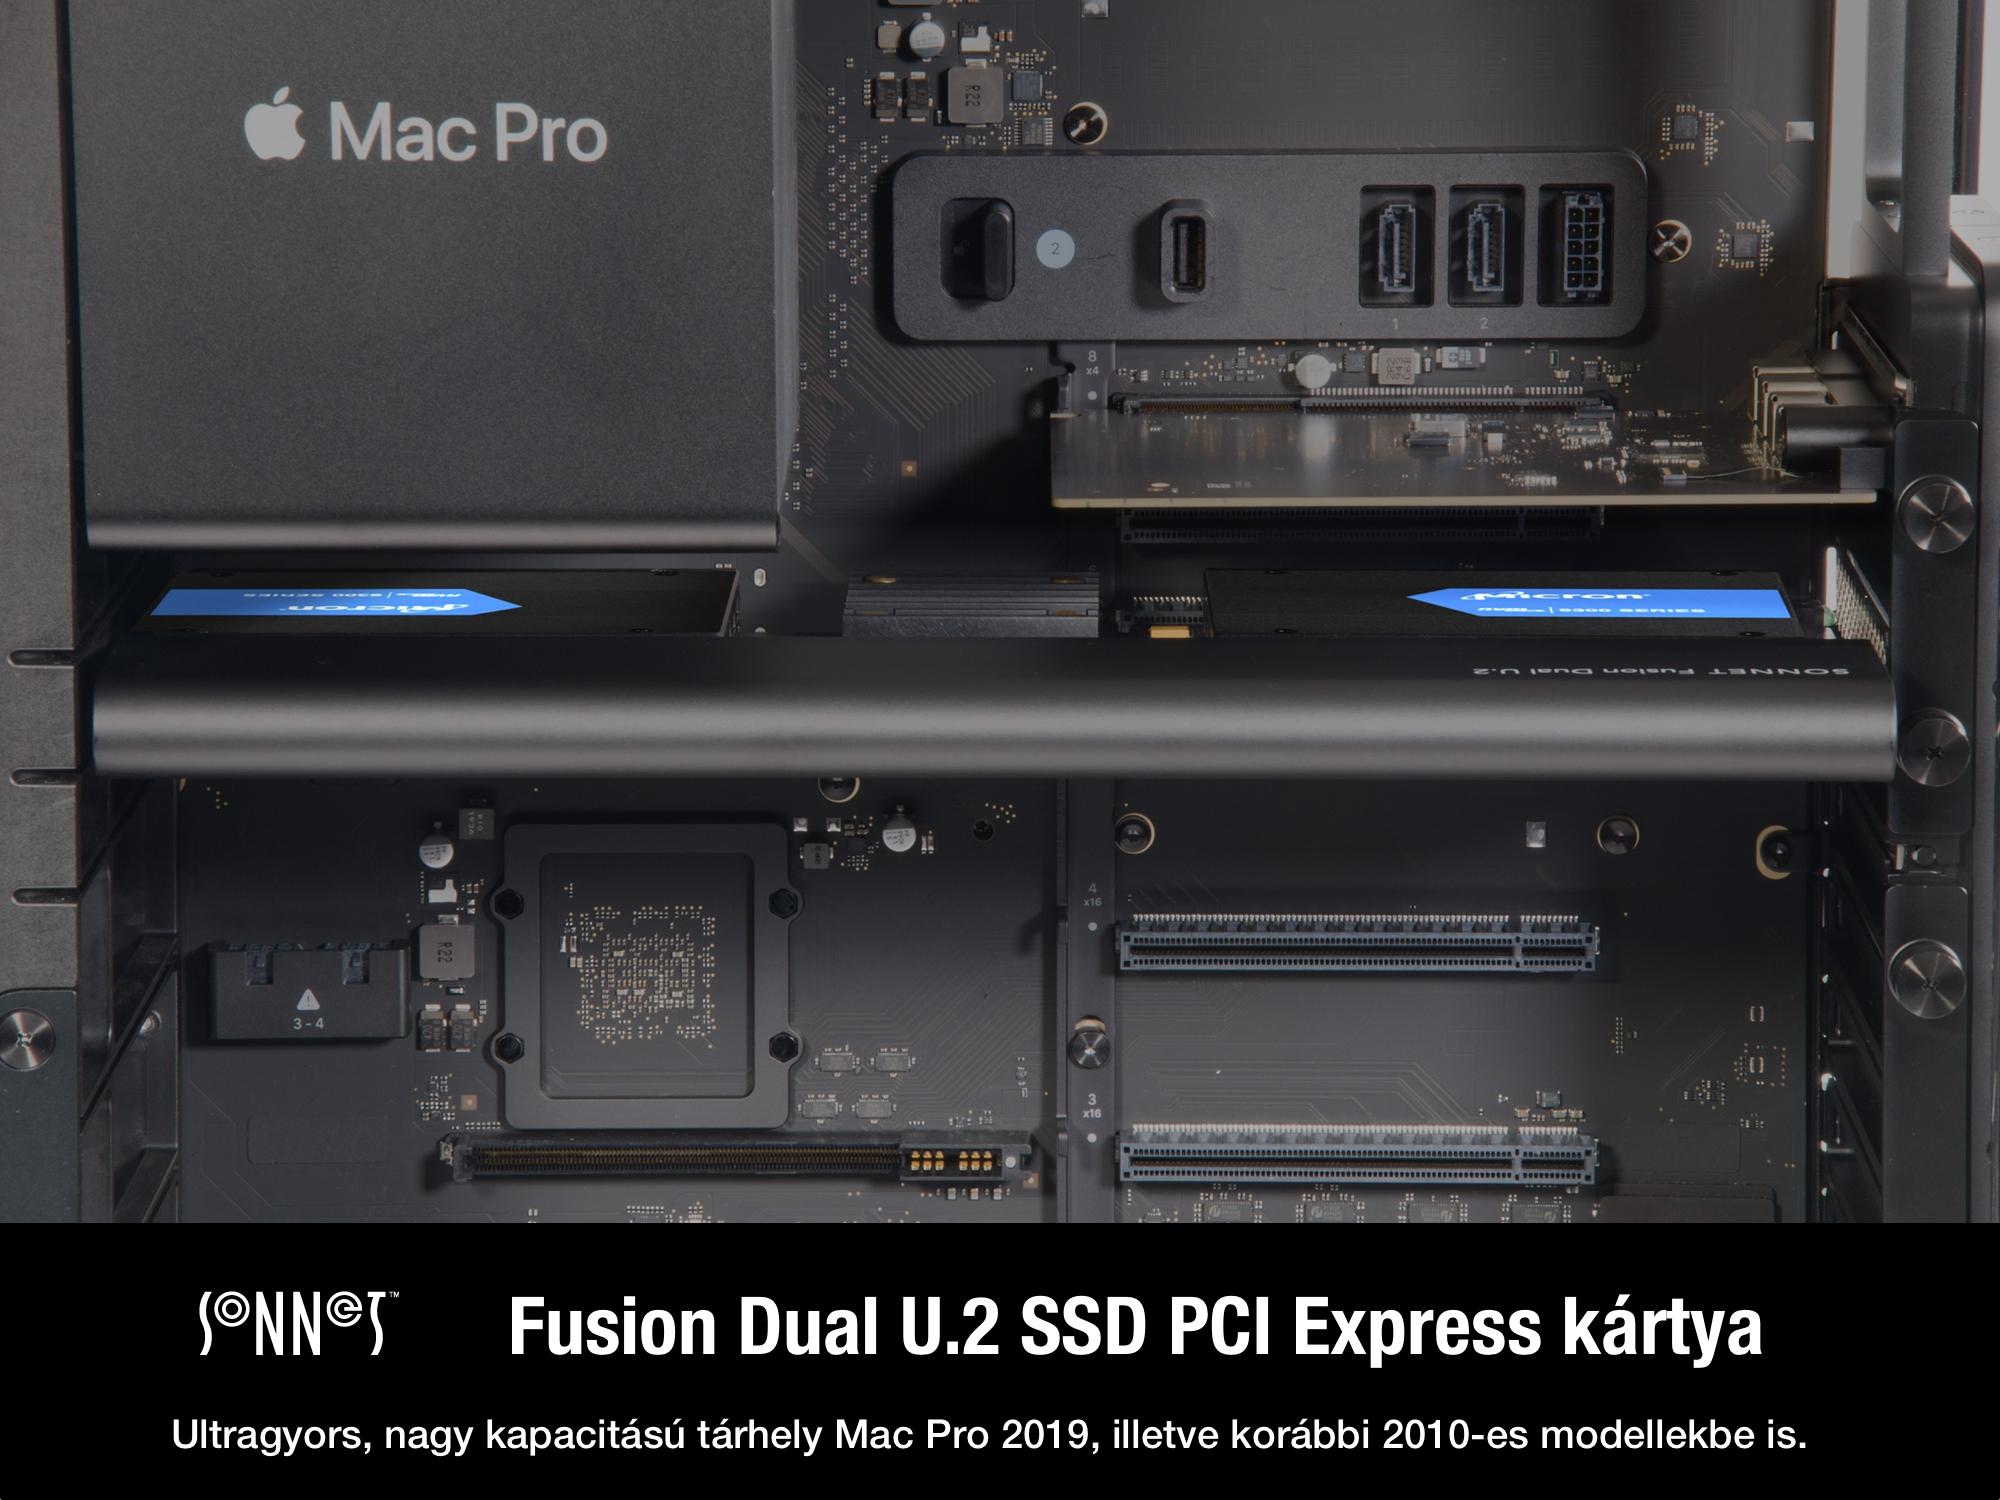 Sonnet Fusion Dual U.2 SSD PCIe Card